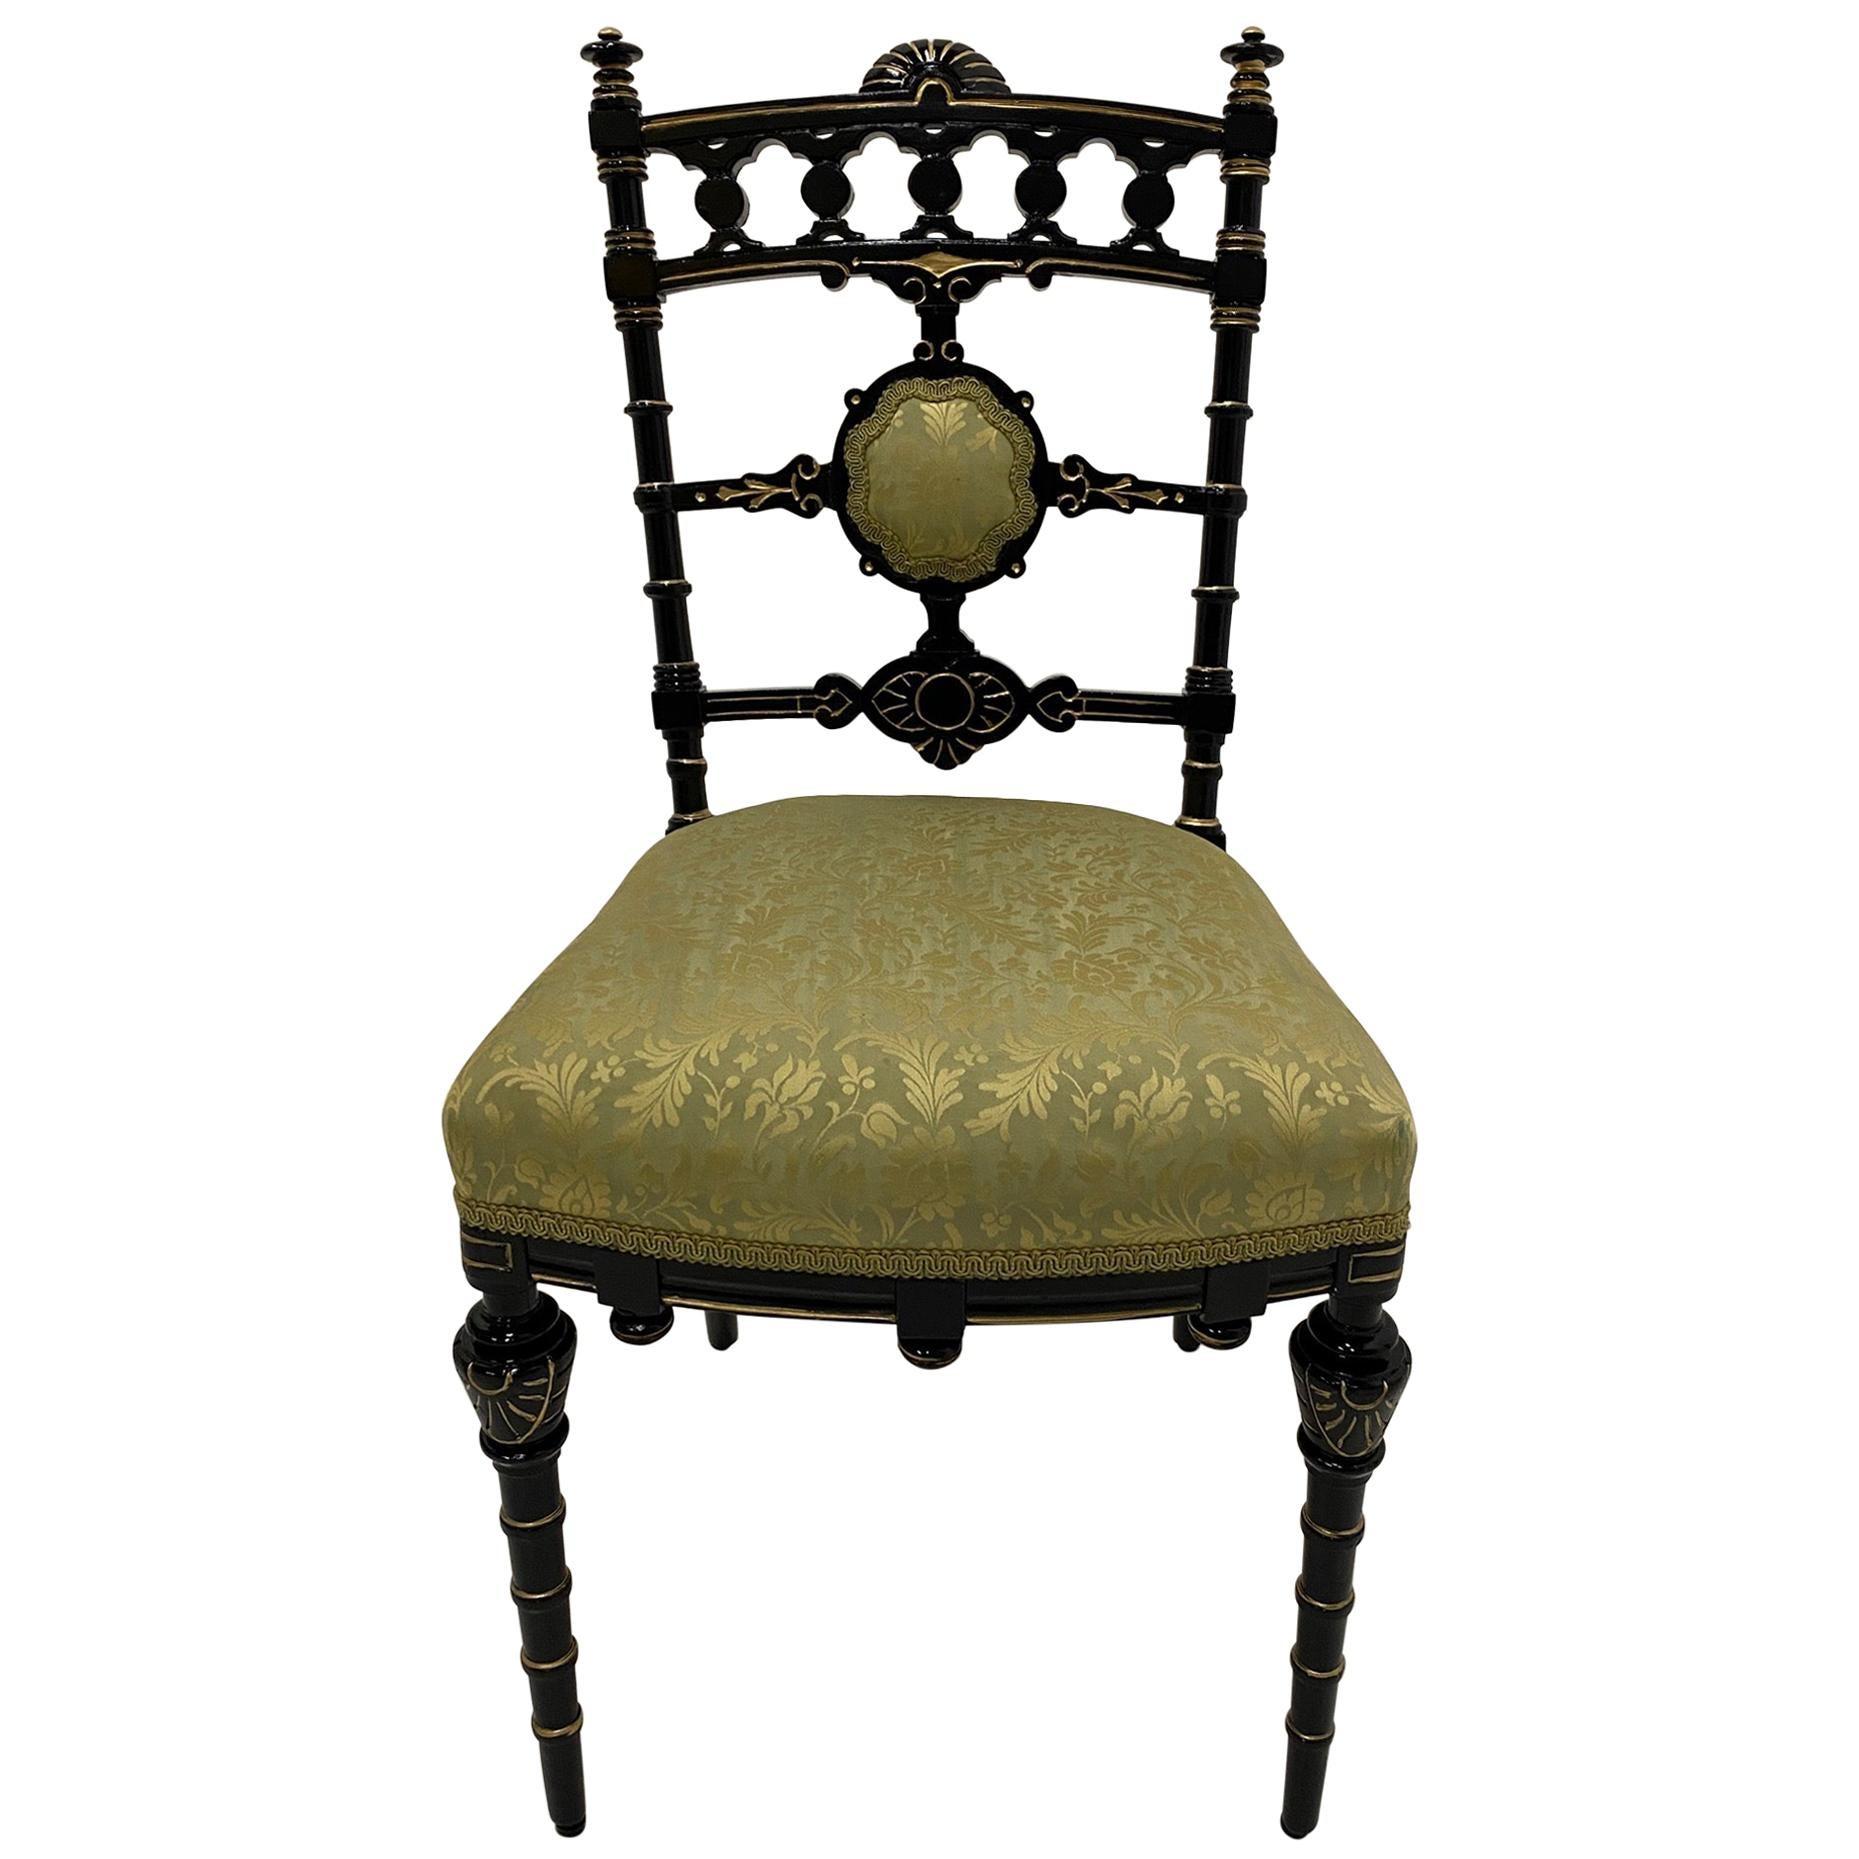 Strikingly Decorative Victorian Aesthetic Movement Gilt & Ebonized Chair